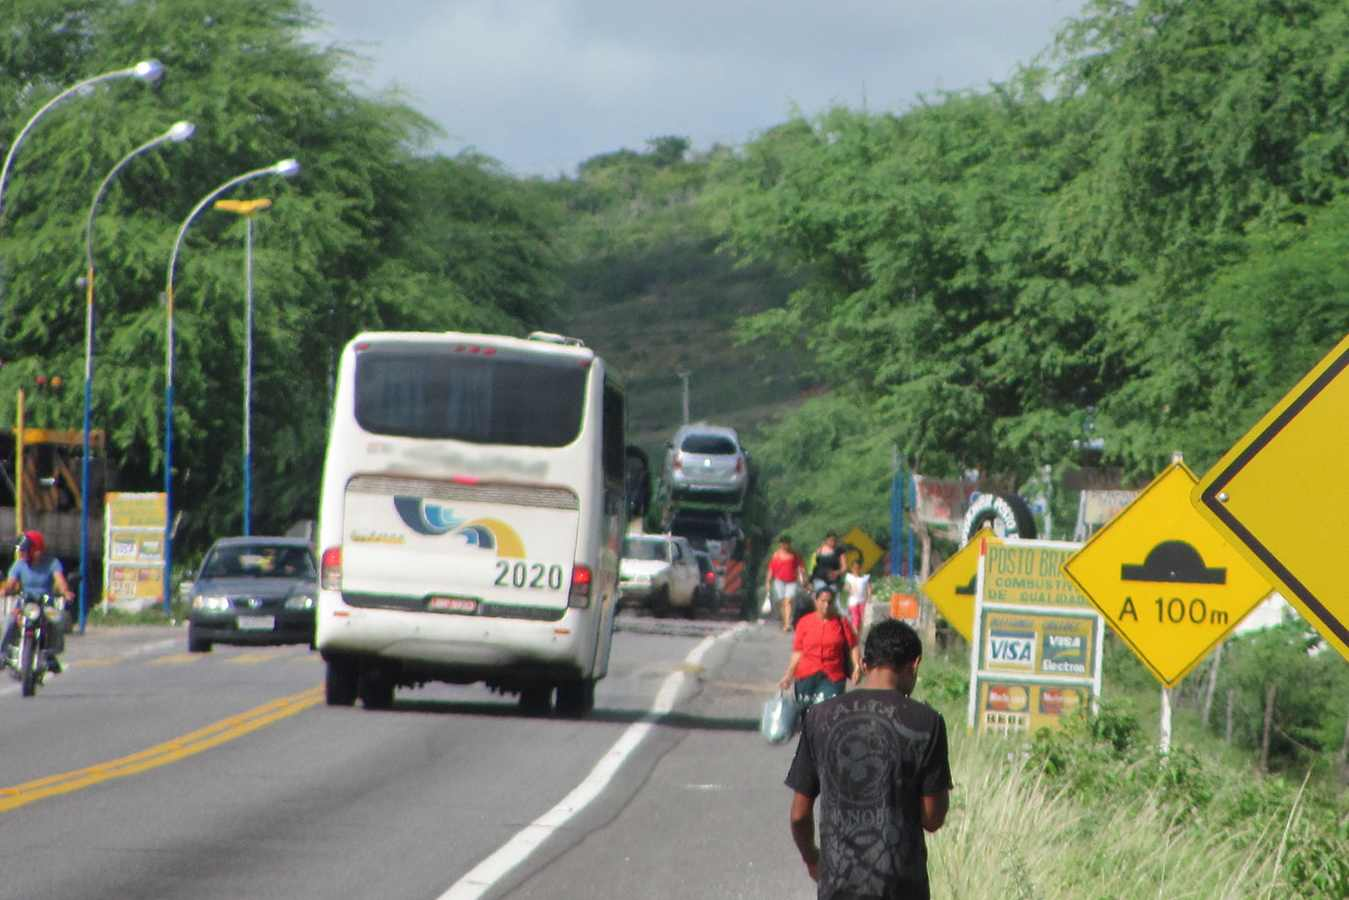 Danos materias: transportador ilegal deve ressarcir Gontijo